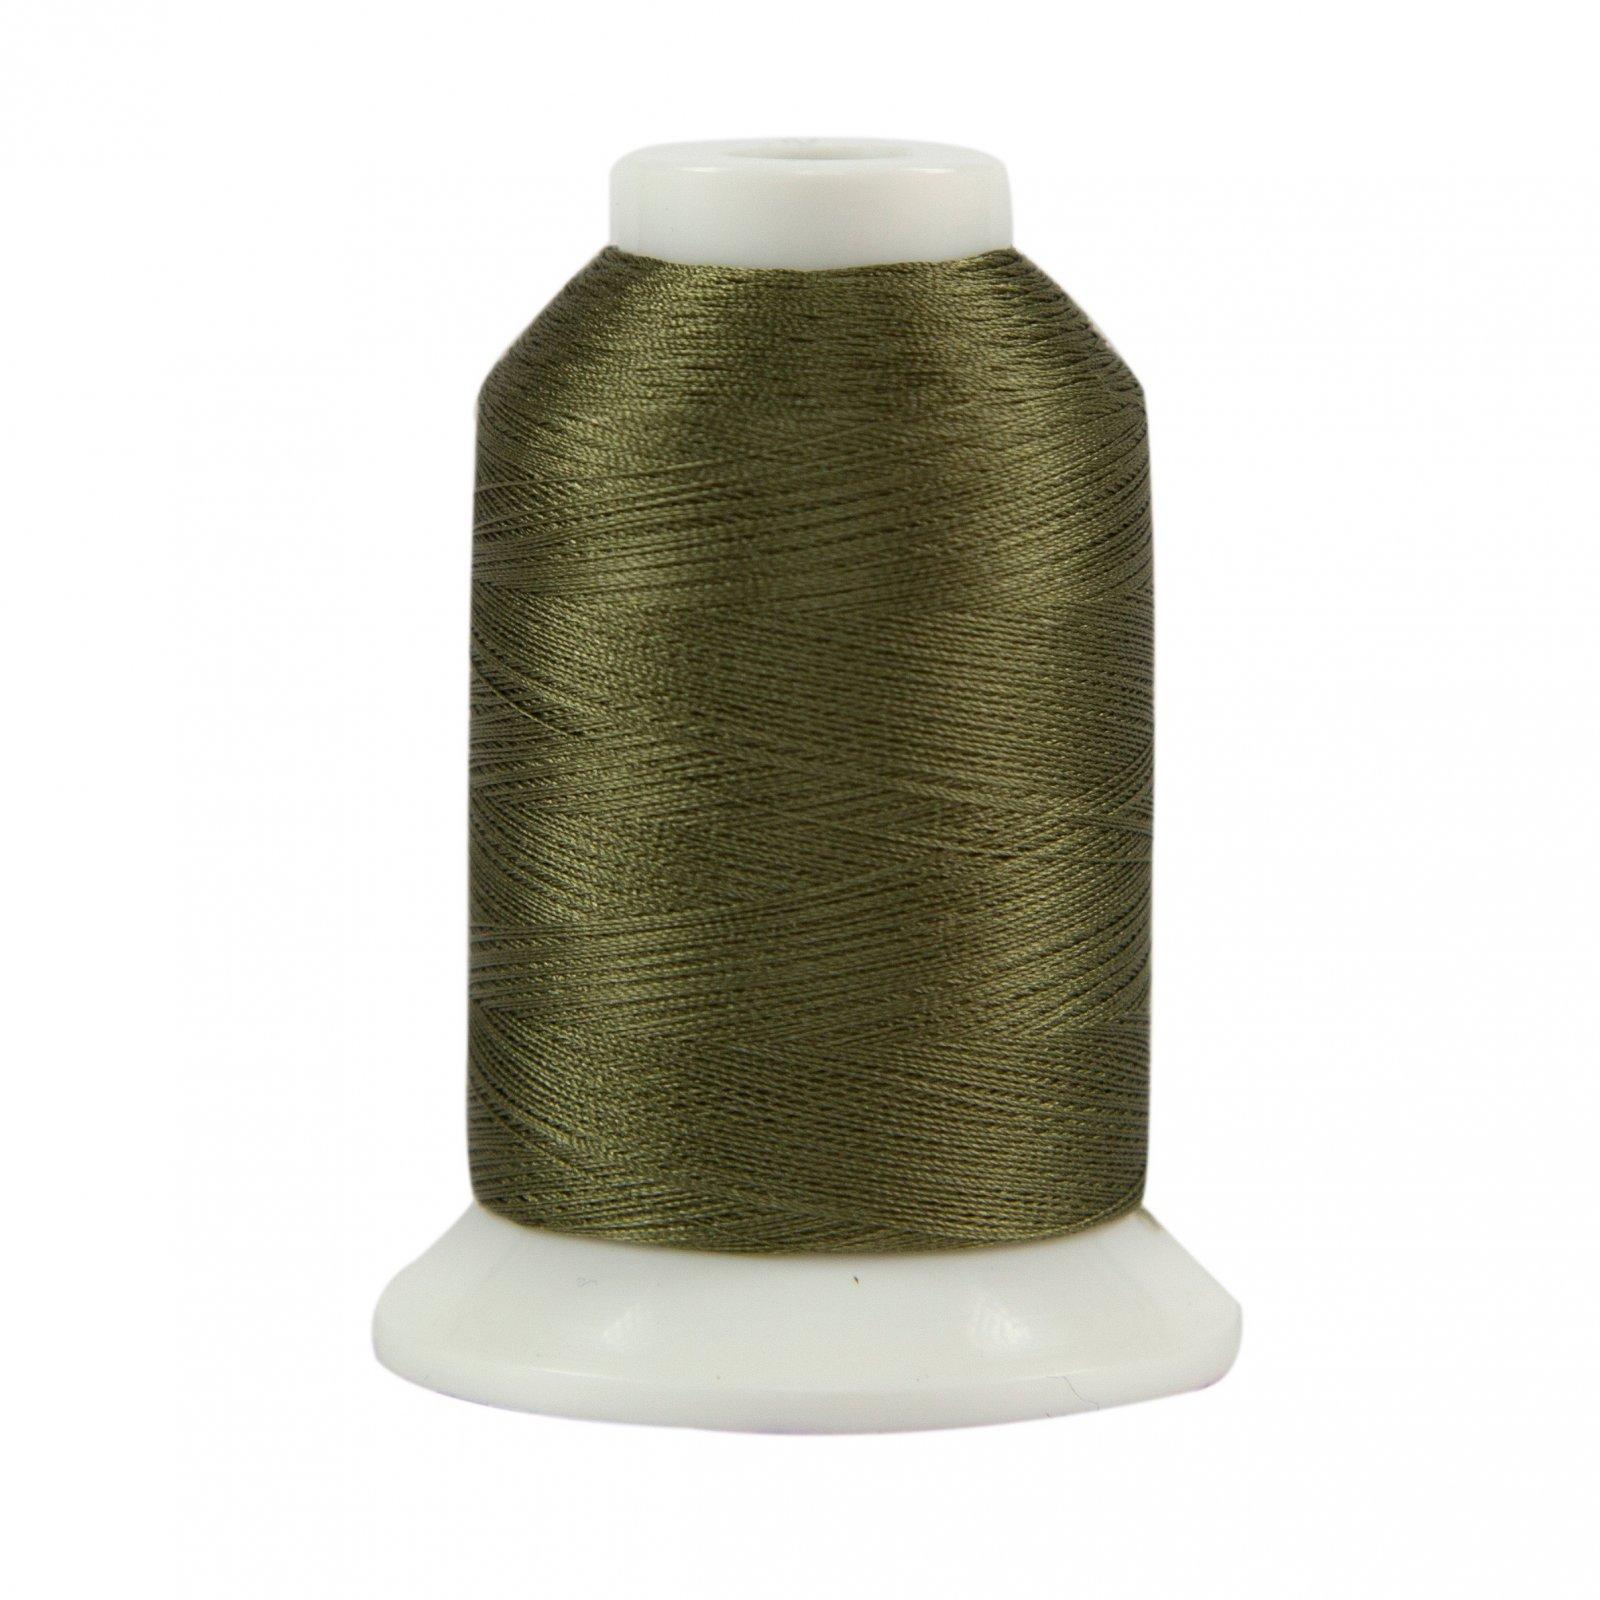 Kimono Silk Thread 100wt 1090yd Garden Green